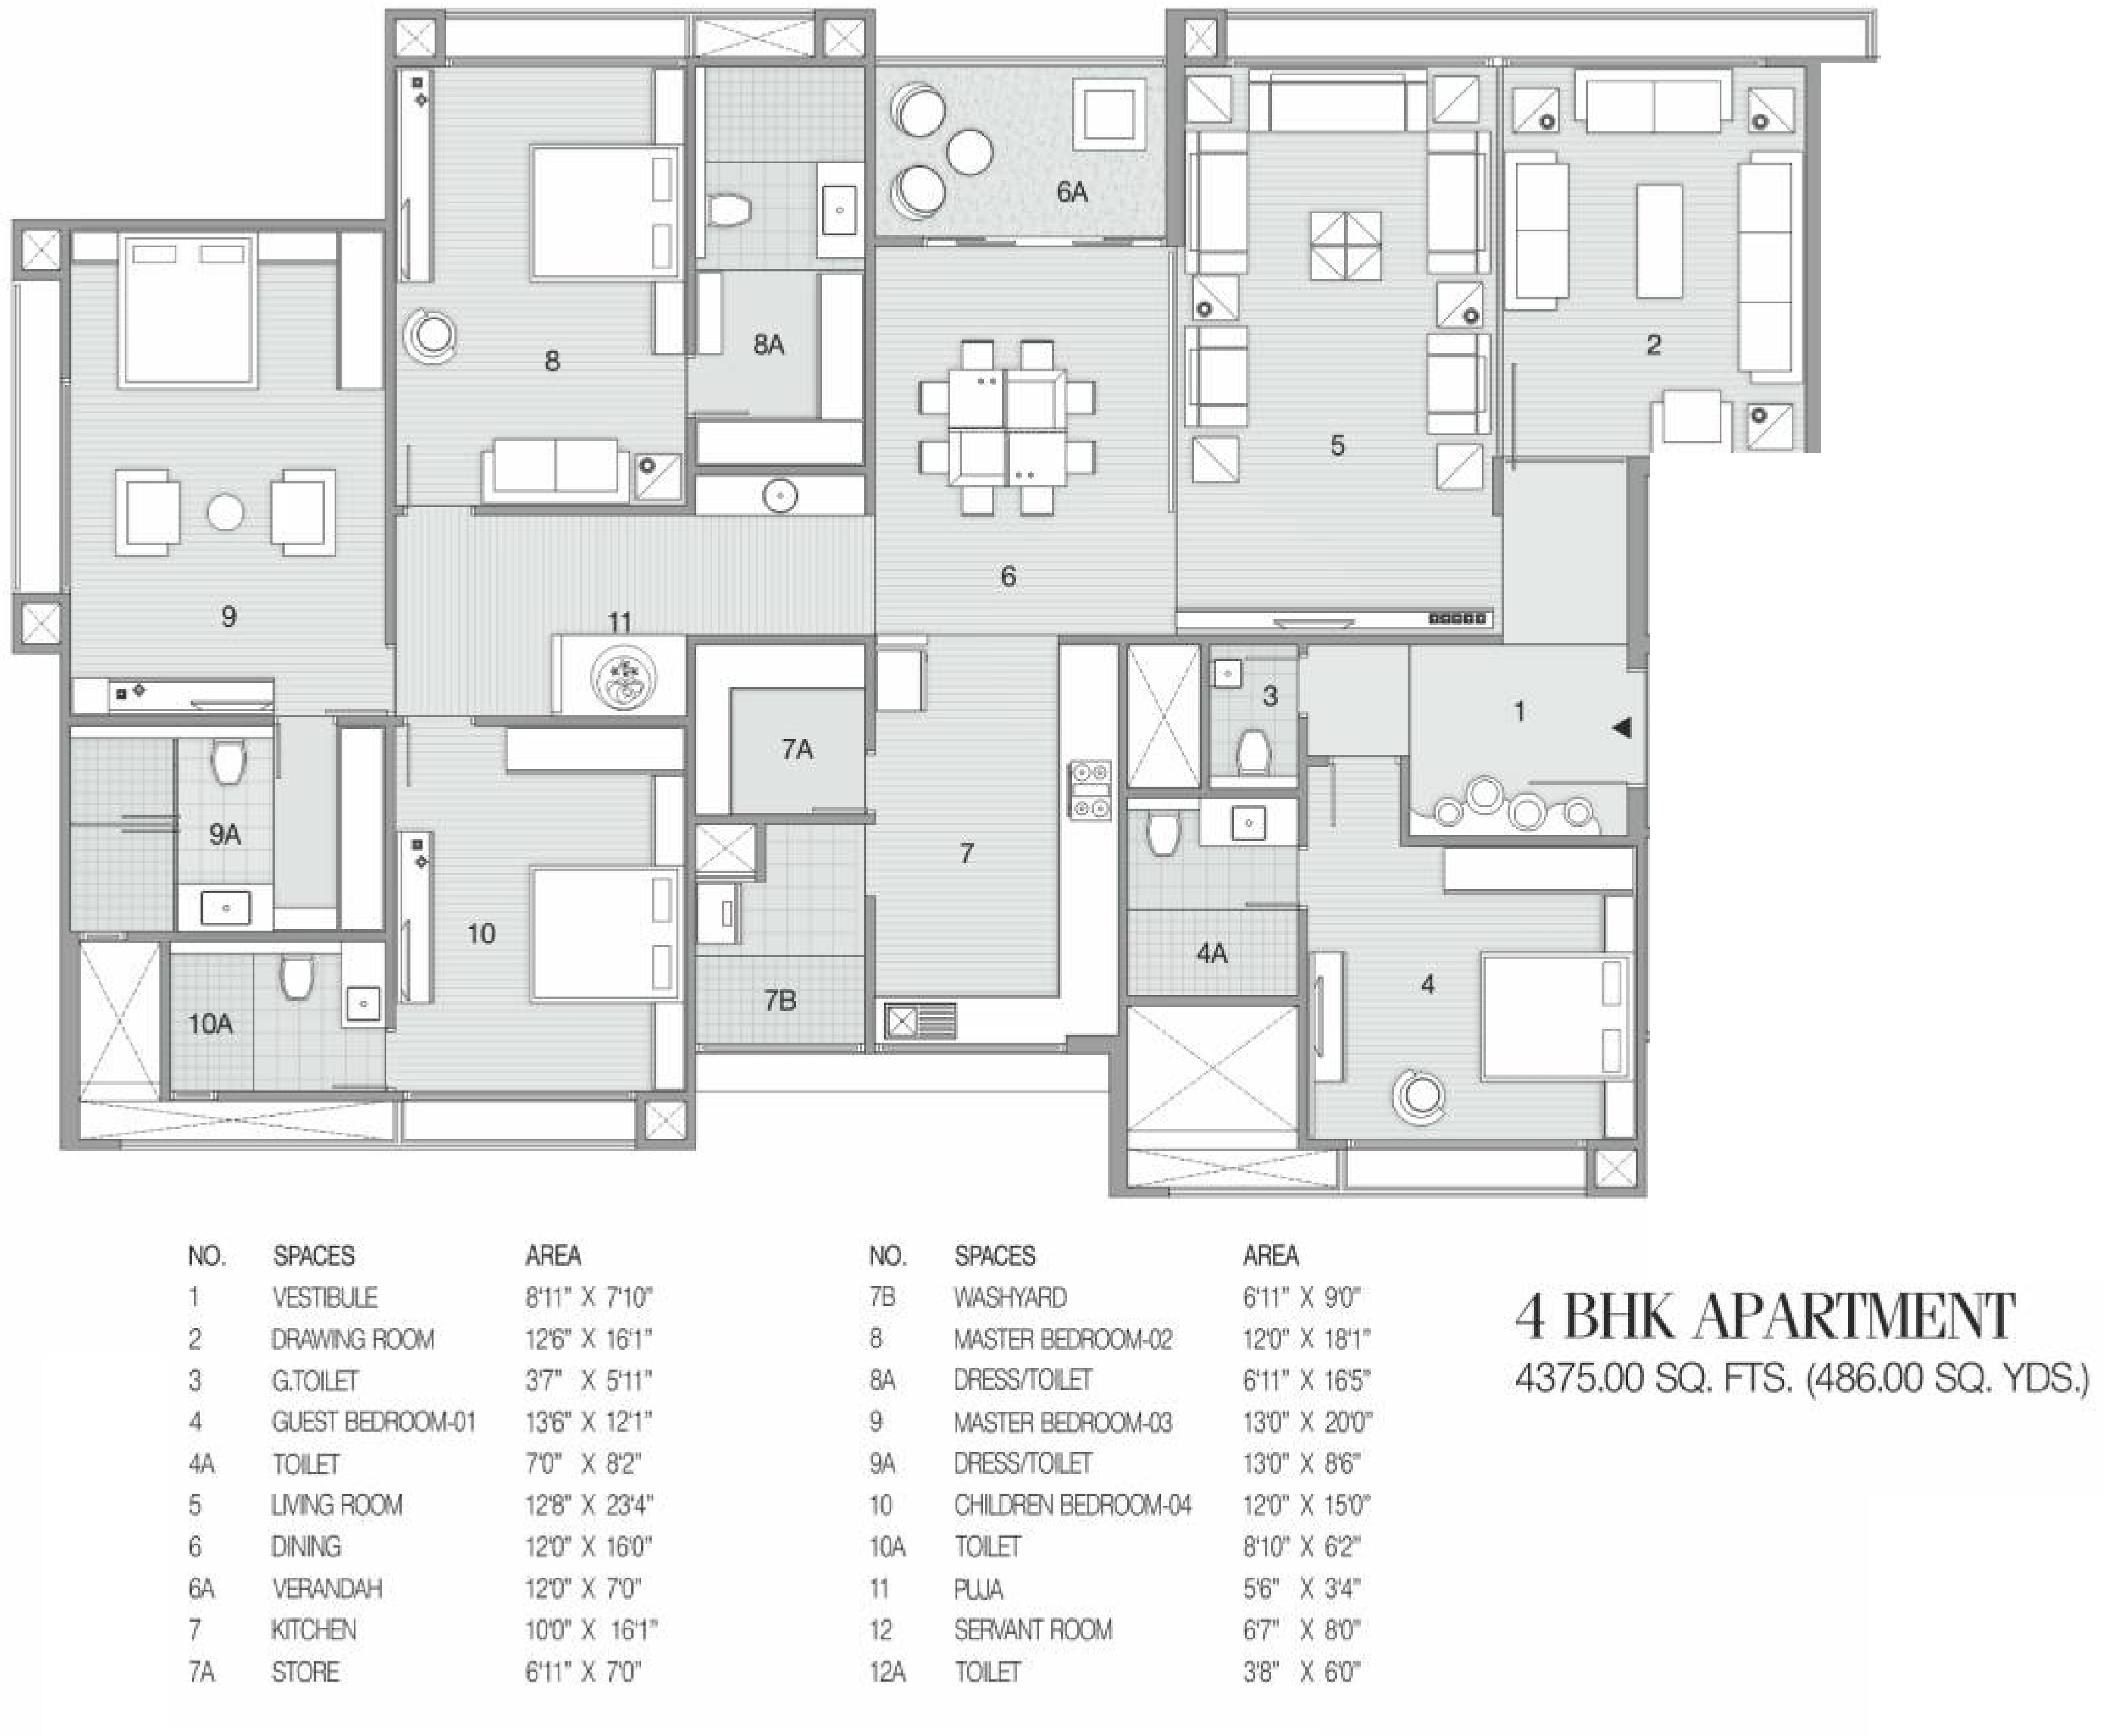 residences floor plan floor plan 3770006?width\\\\\\\\\\\\\\\=90\\\\\\\\\\\\\\\&height\\\\\\\\\\\\\\\=120 beechcraft c90 fire bottes wiring diagram,c \u2022 edmiracle co  at gsmportal.co